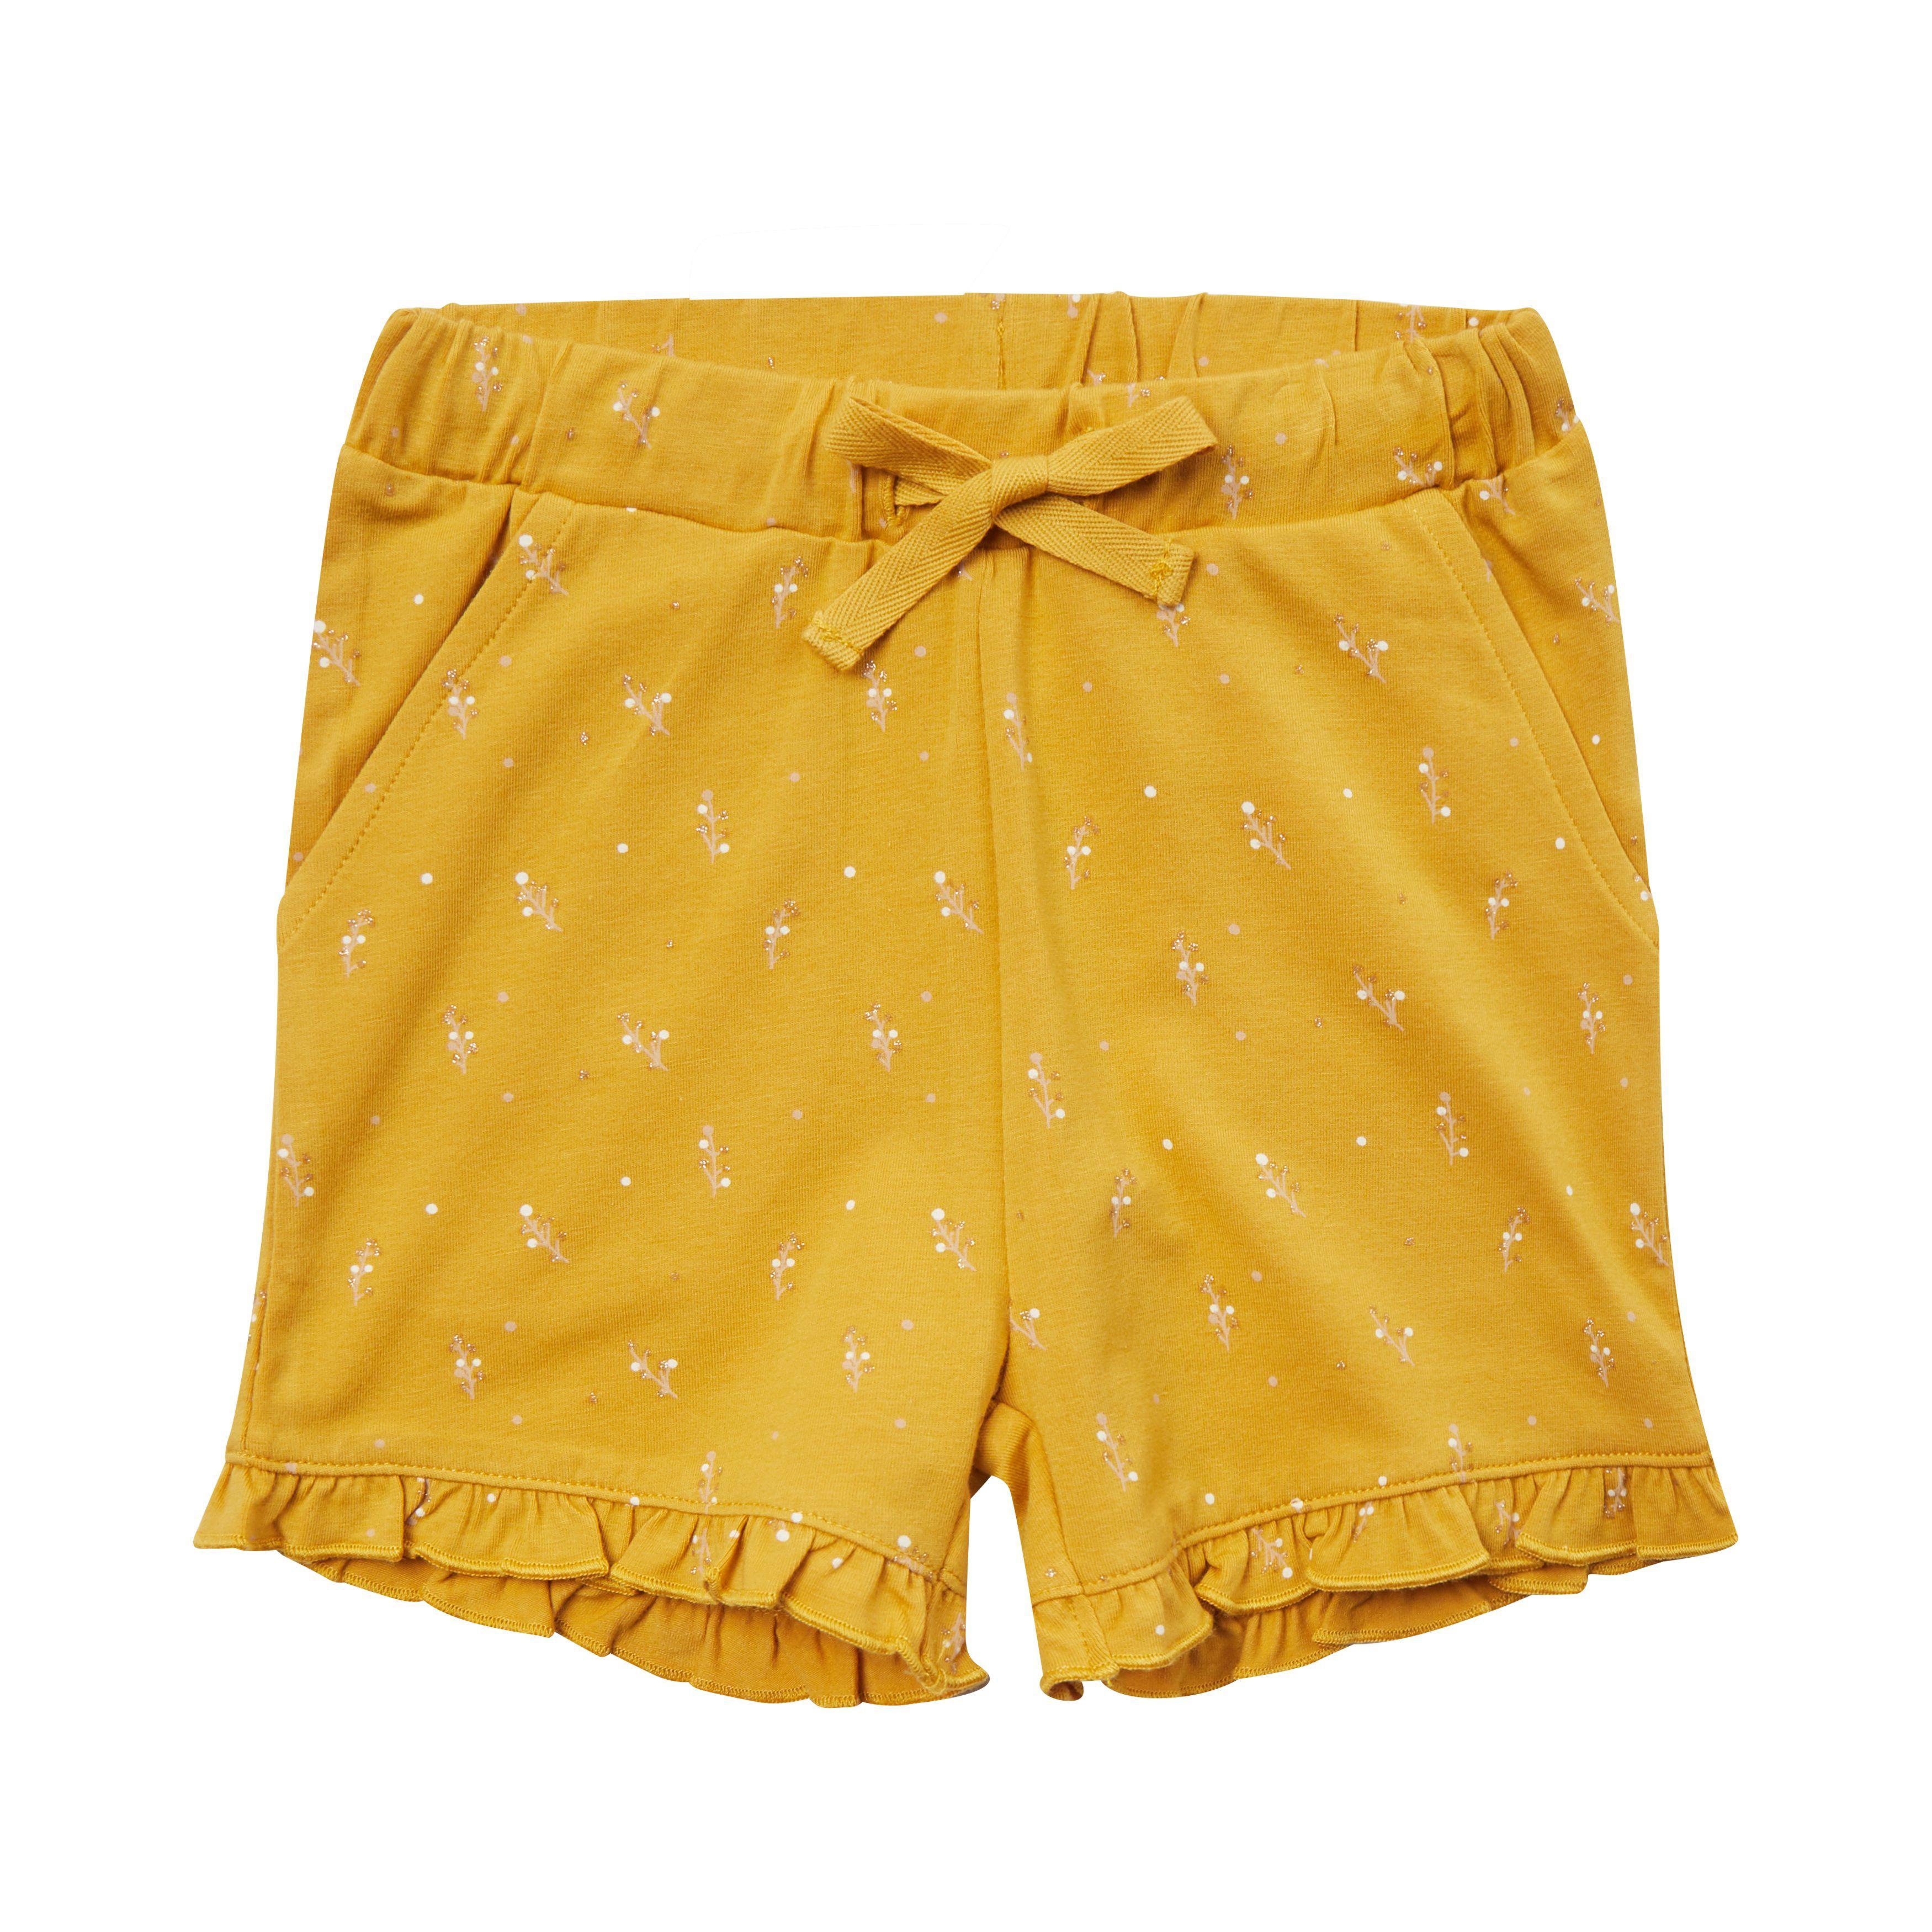 Petit by Sofie Schnoor Daphne shorts, mustard, 92